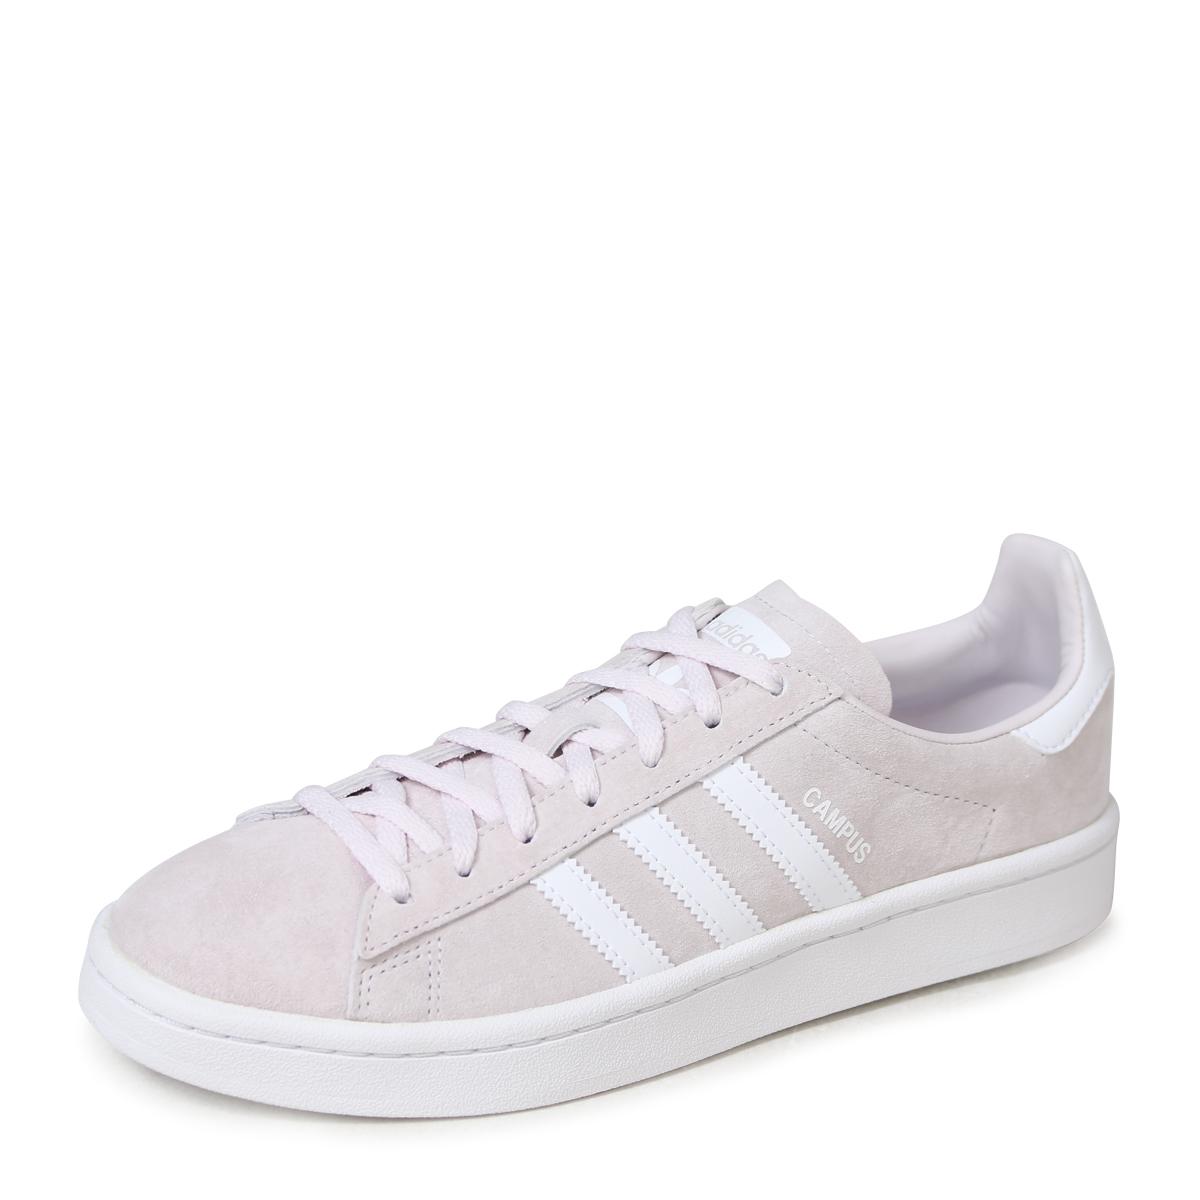 size 40 d8452 5f5ae ALLSPORTS adidas Originals CAMPUS W Adidas original scan pass Ladys  sneakers CQ2106 pink 515 Shinnyu load 185  Rakuten Global Market